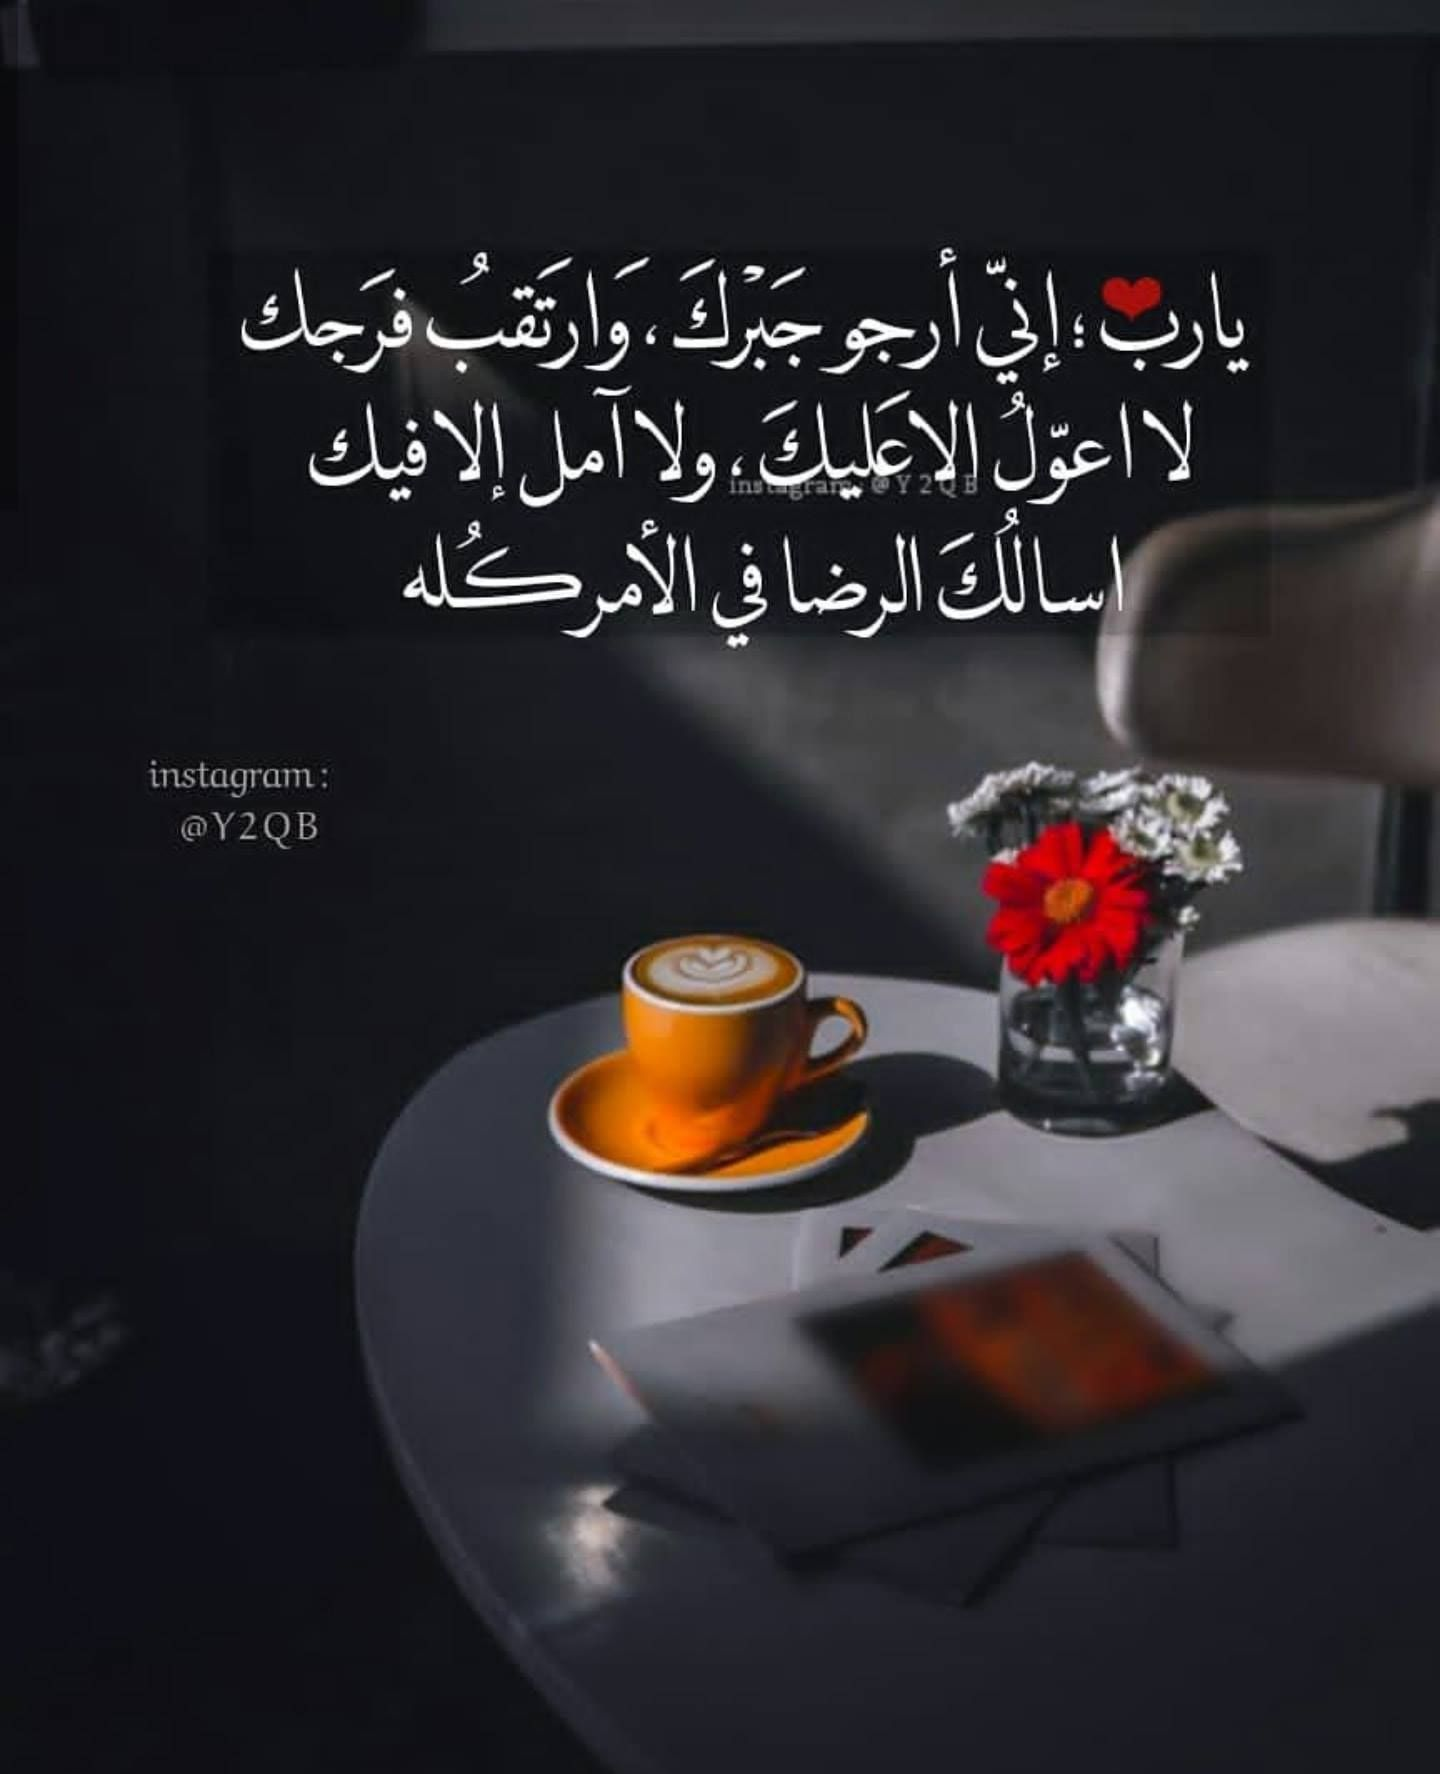 Pin By القيصر Abu Wesam On Loves Prayers Islamic Quotes Islam